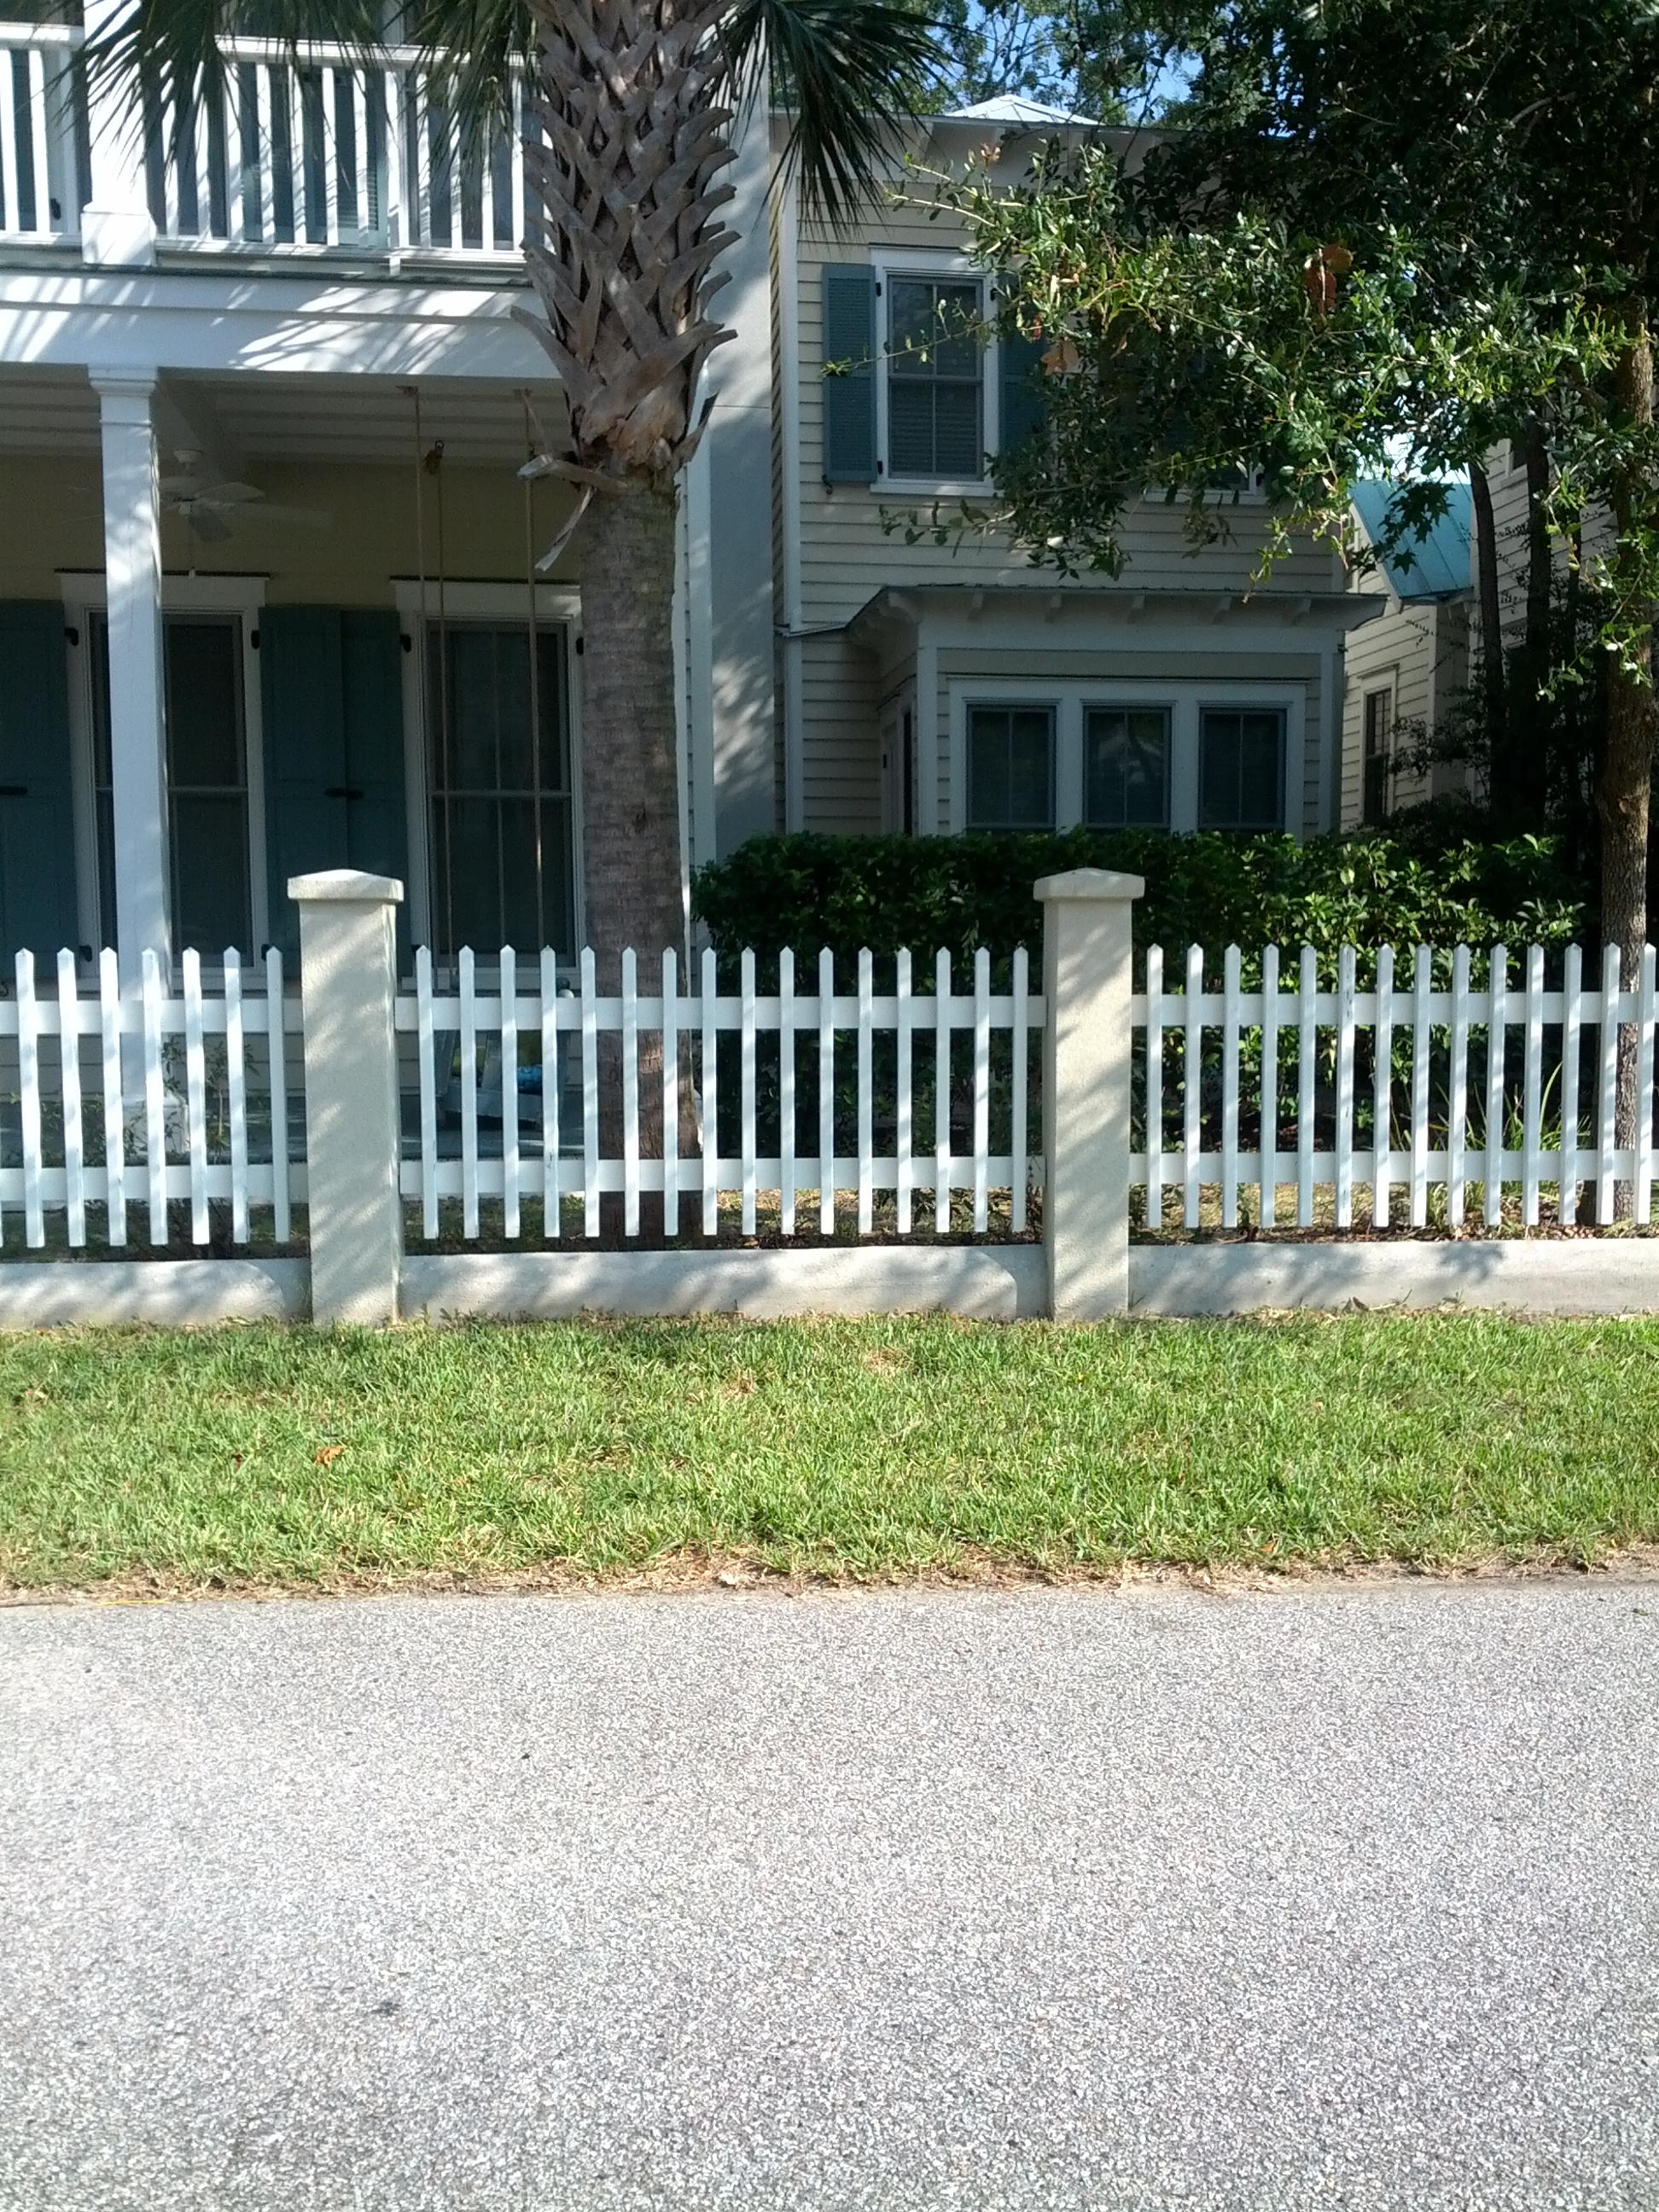 4 feet picket fence between stucco